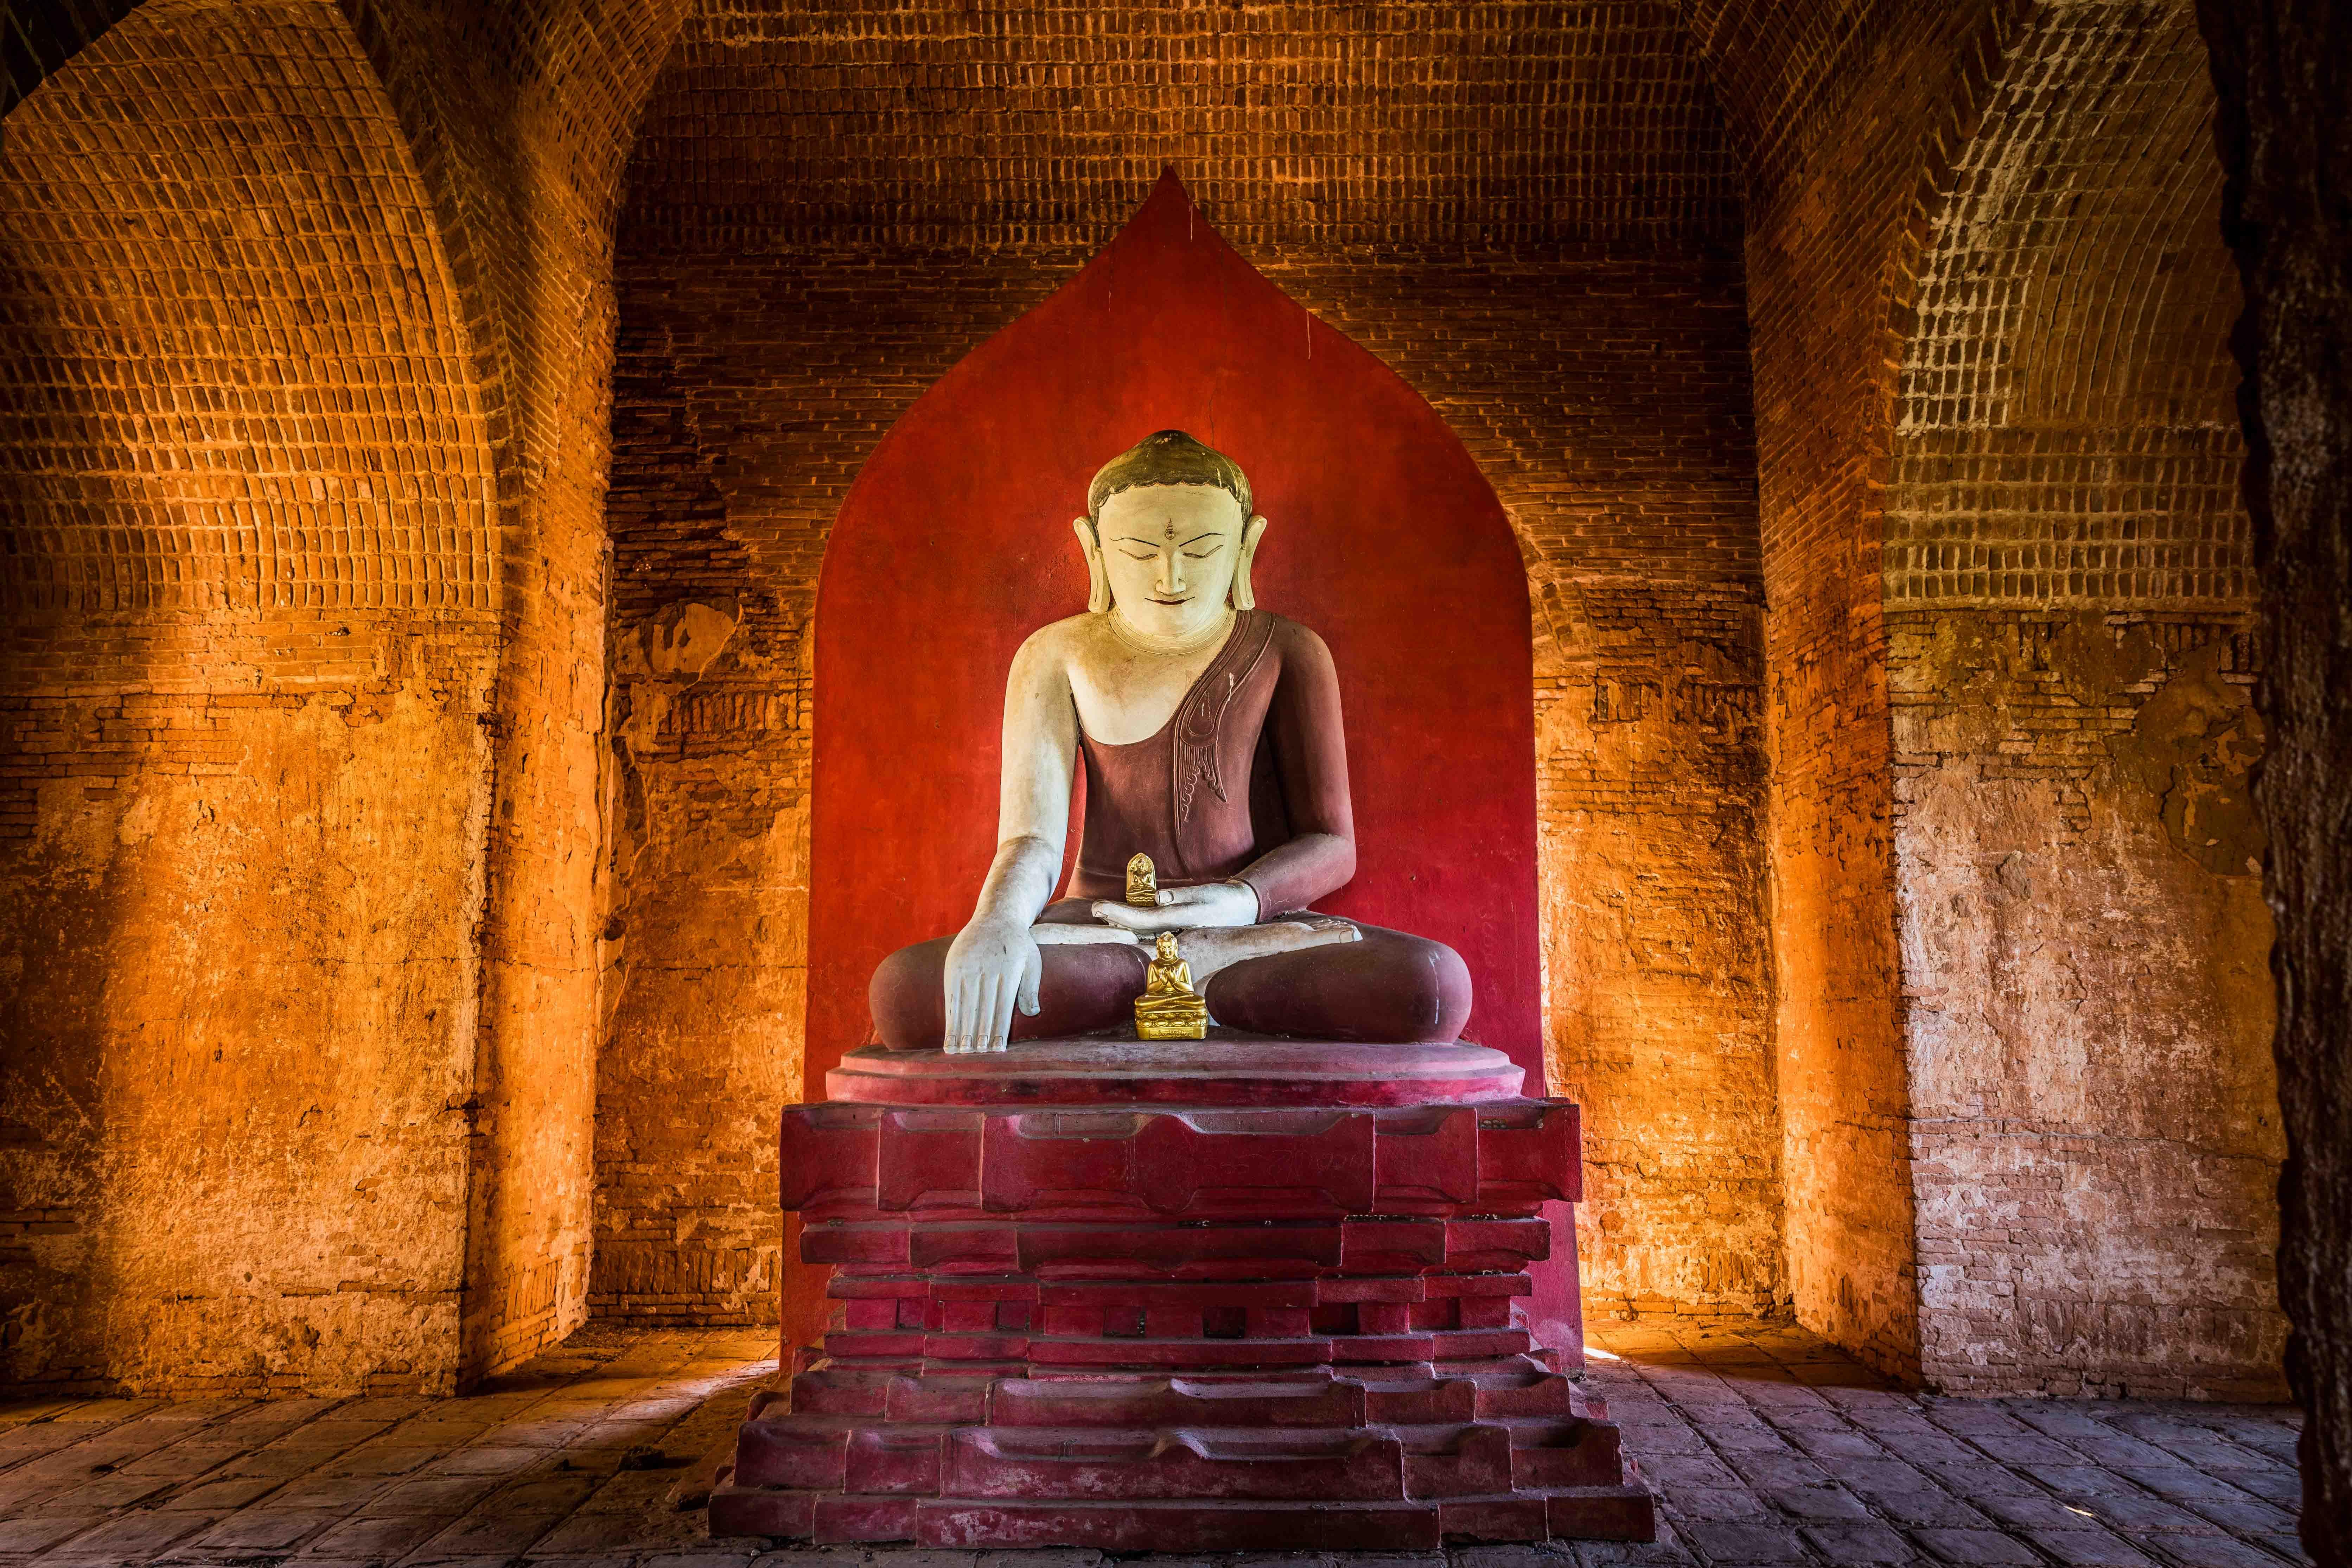 temple Buddha, Earth-Witness mudra